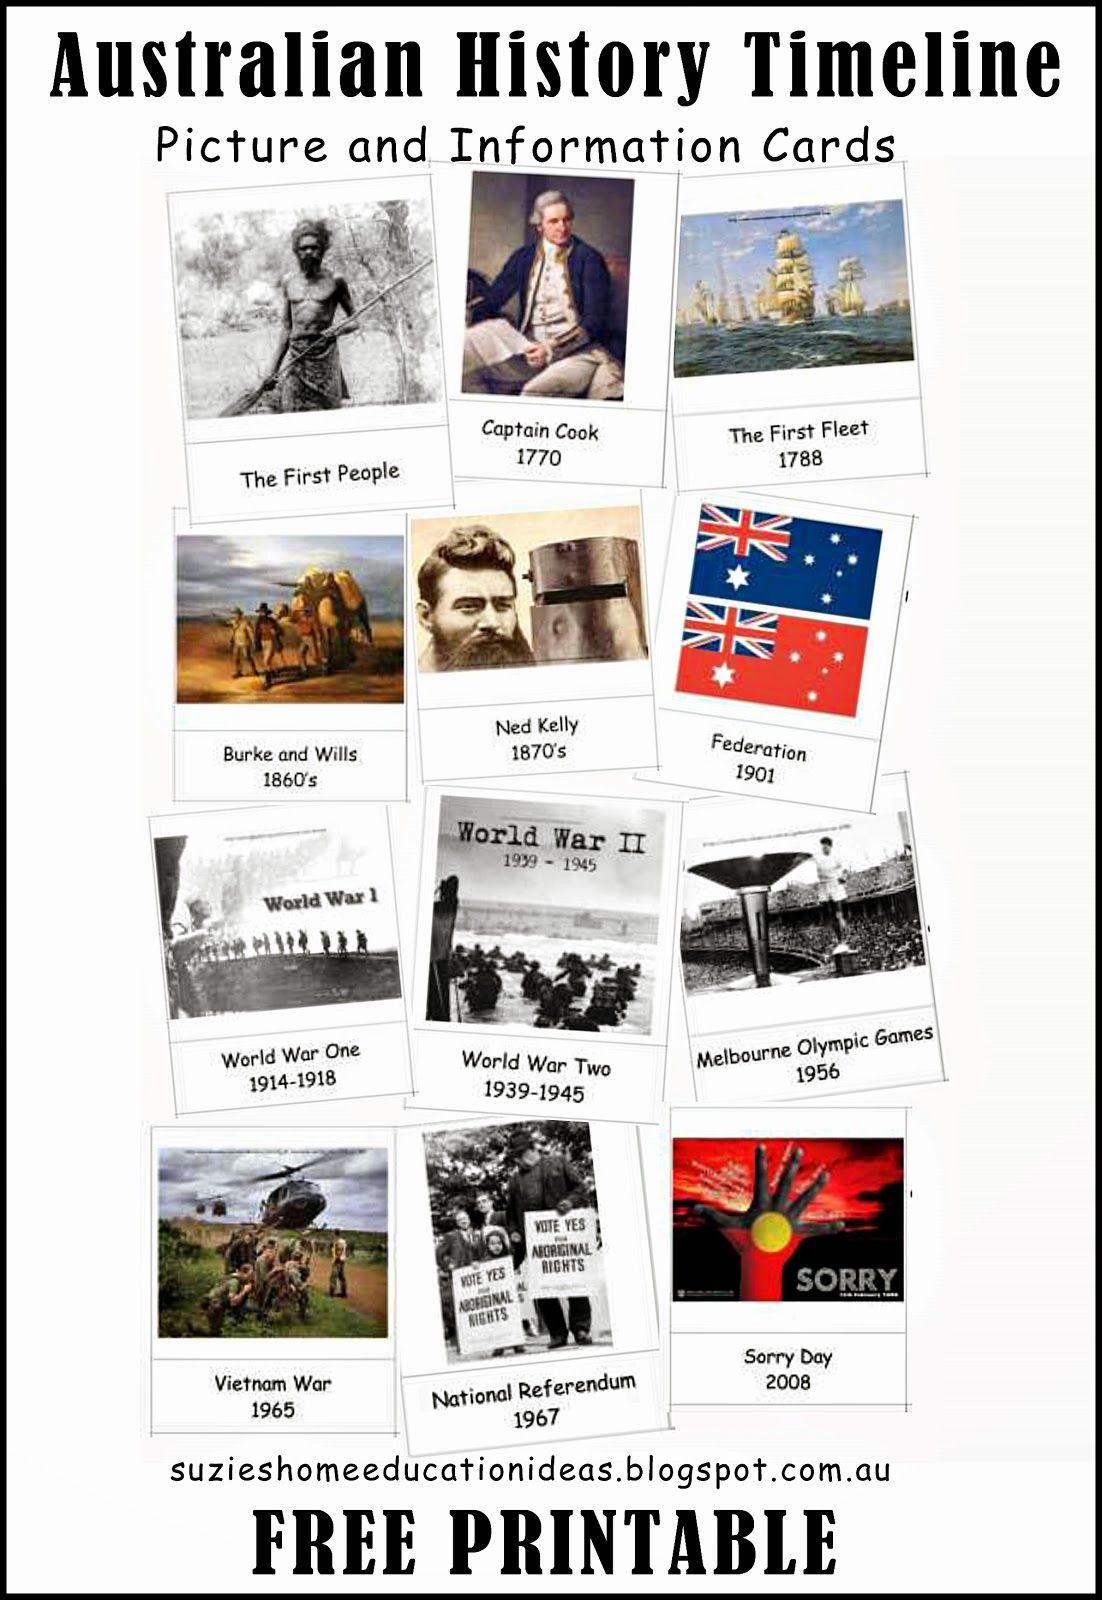 Introducing Australian History